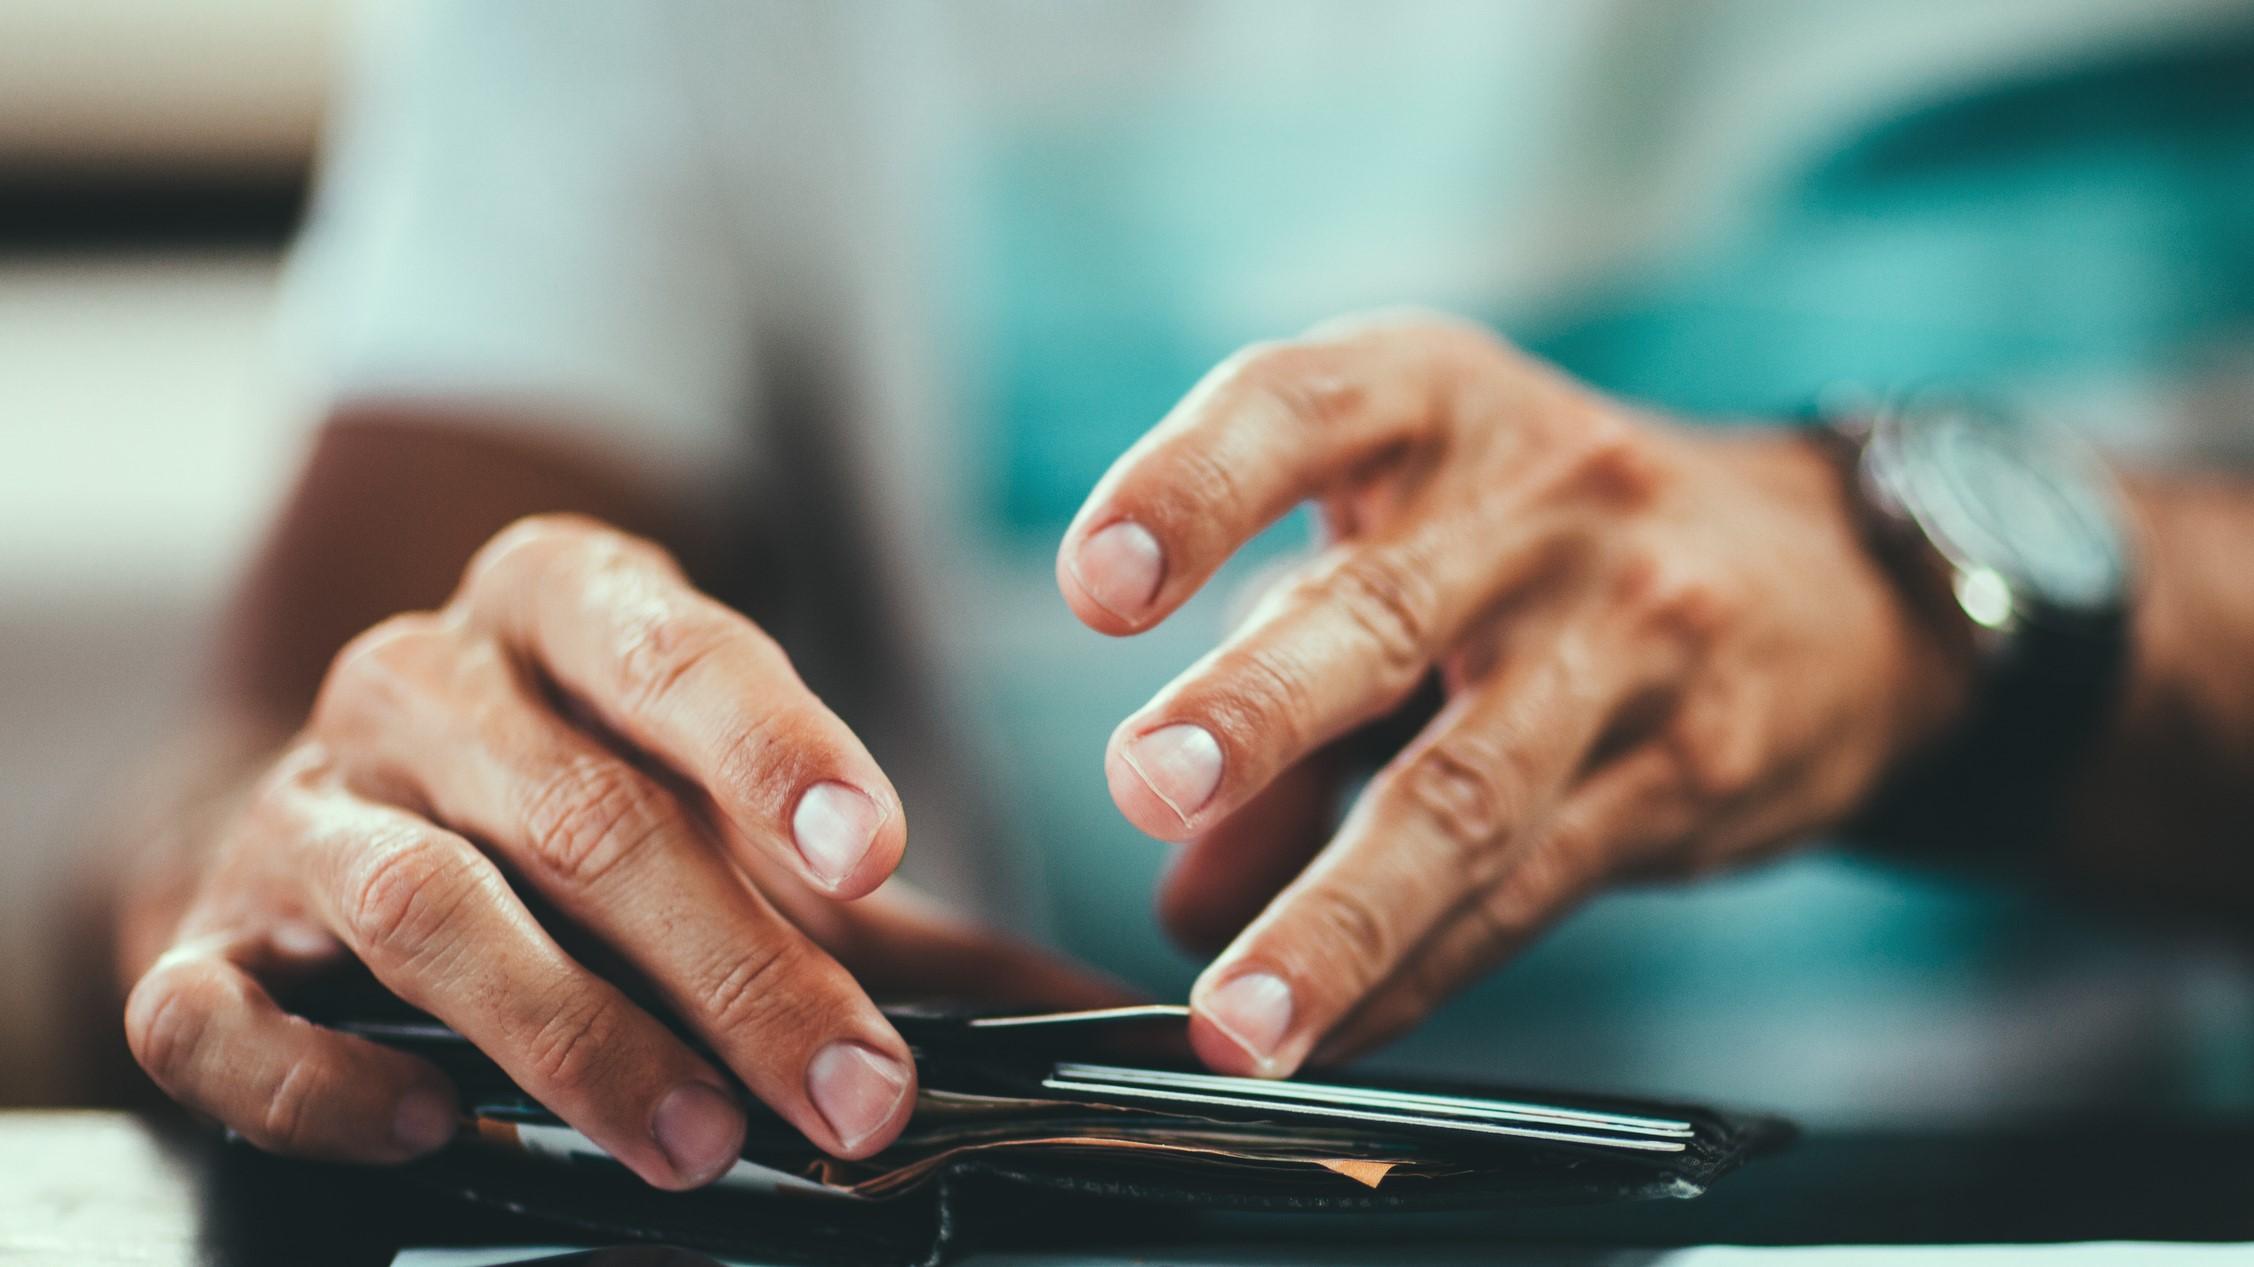 Man looks through wallet